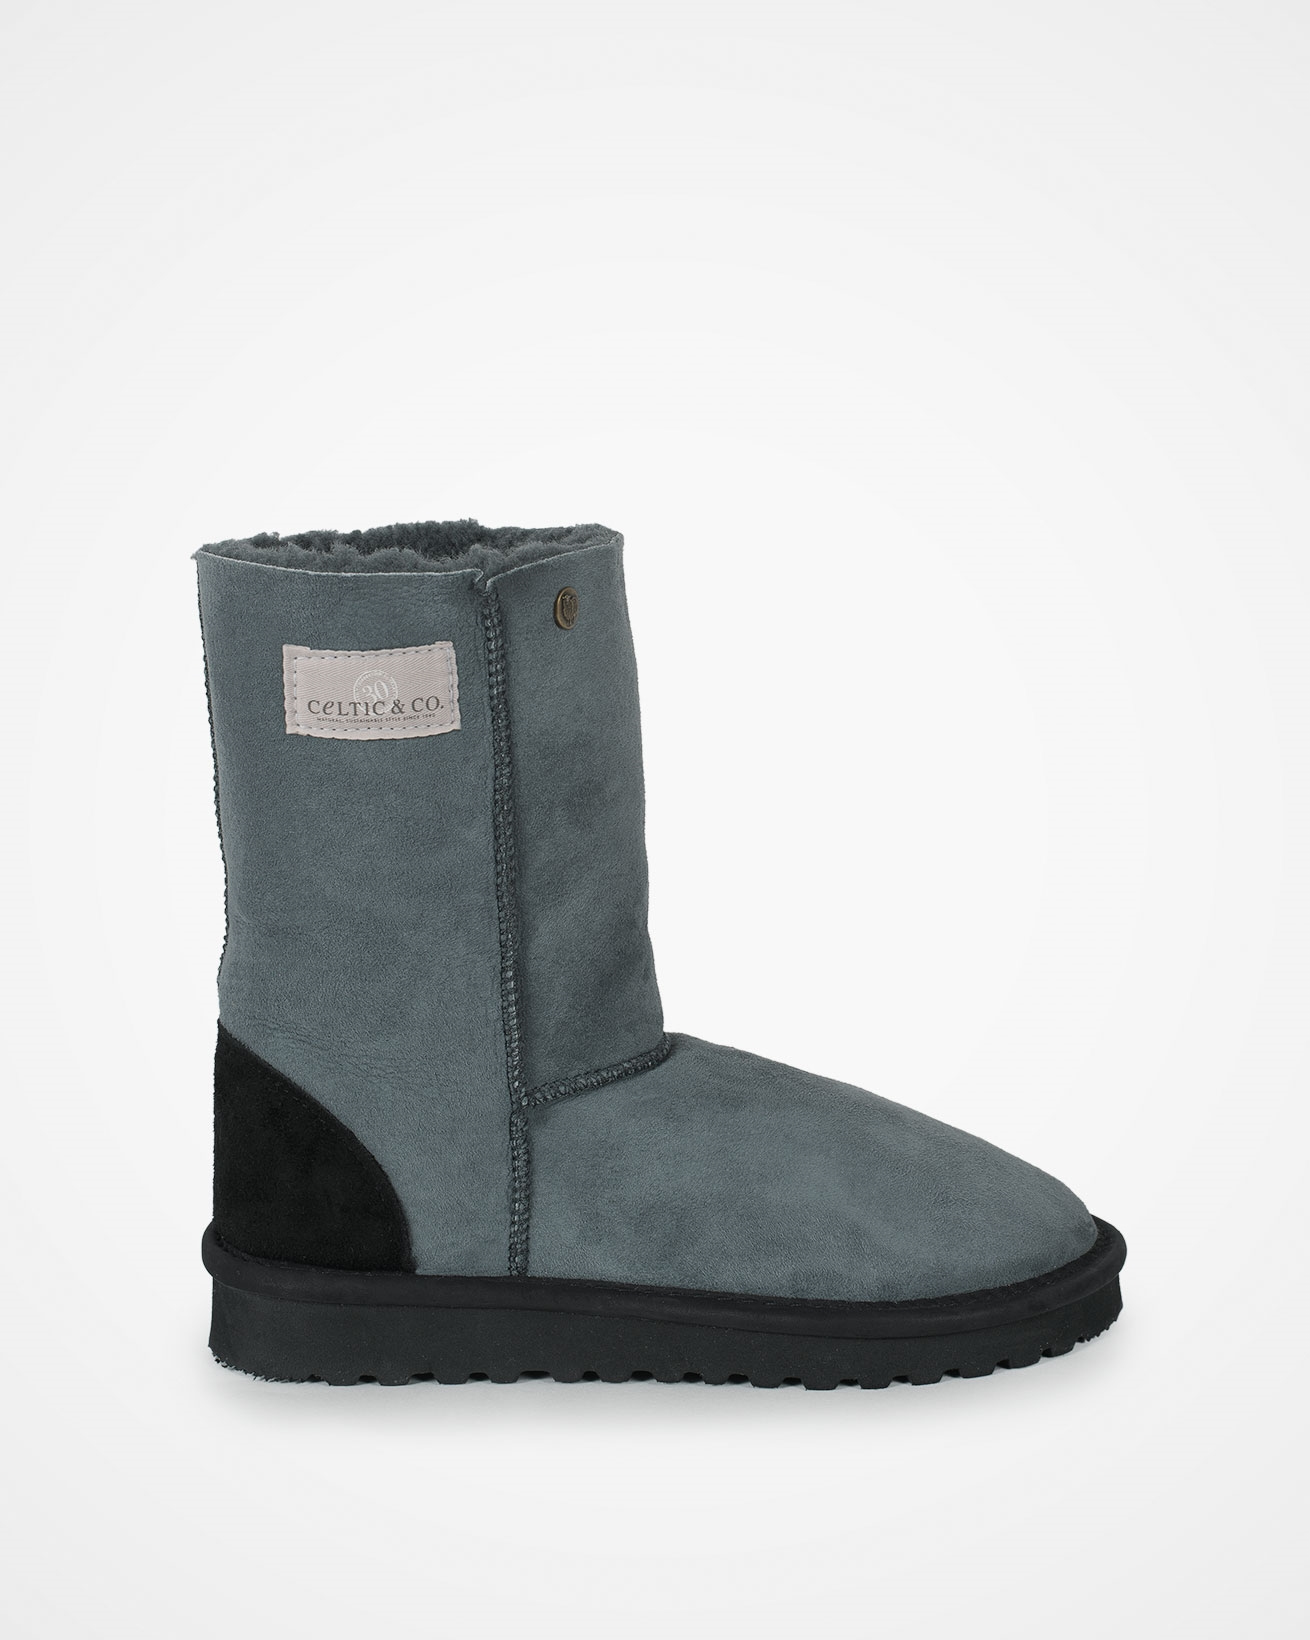 6614_original-celt-boots-regular_icon-dark-grey_outside.jpg